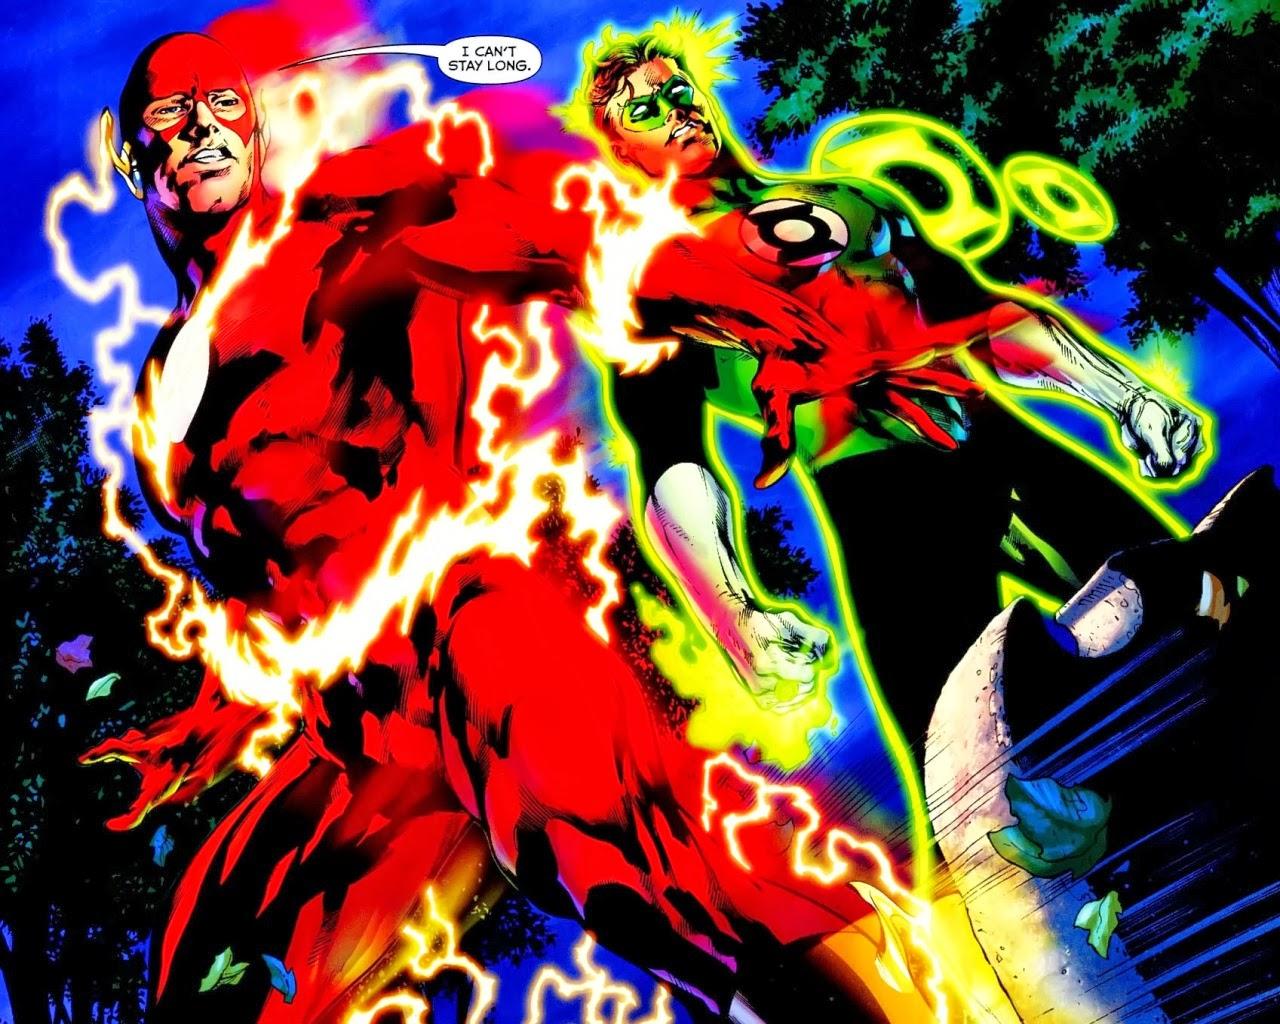 comic, comicbook, capitan America, Gotham Central, flash, Green Lantern, lobezno, Deadpool, joe Kelli Ed mcguiness, hawkeye, adaredevil, brubaker, greg rucka, mark waid, steve epting, michel lark, fraction, david Aja, samne, Crying Grumpies